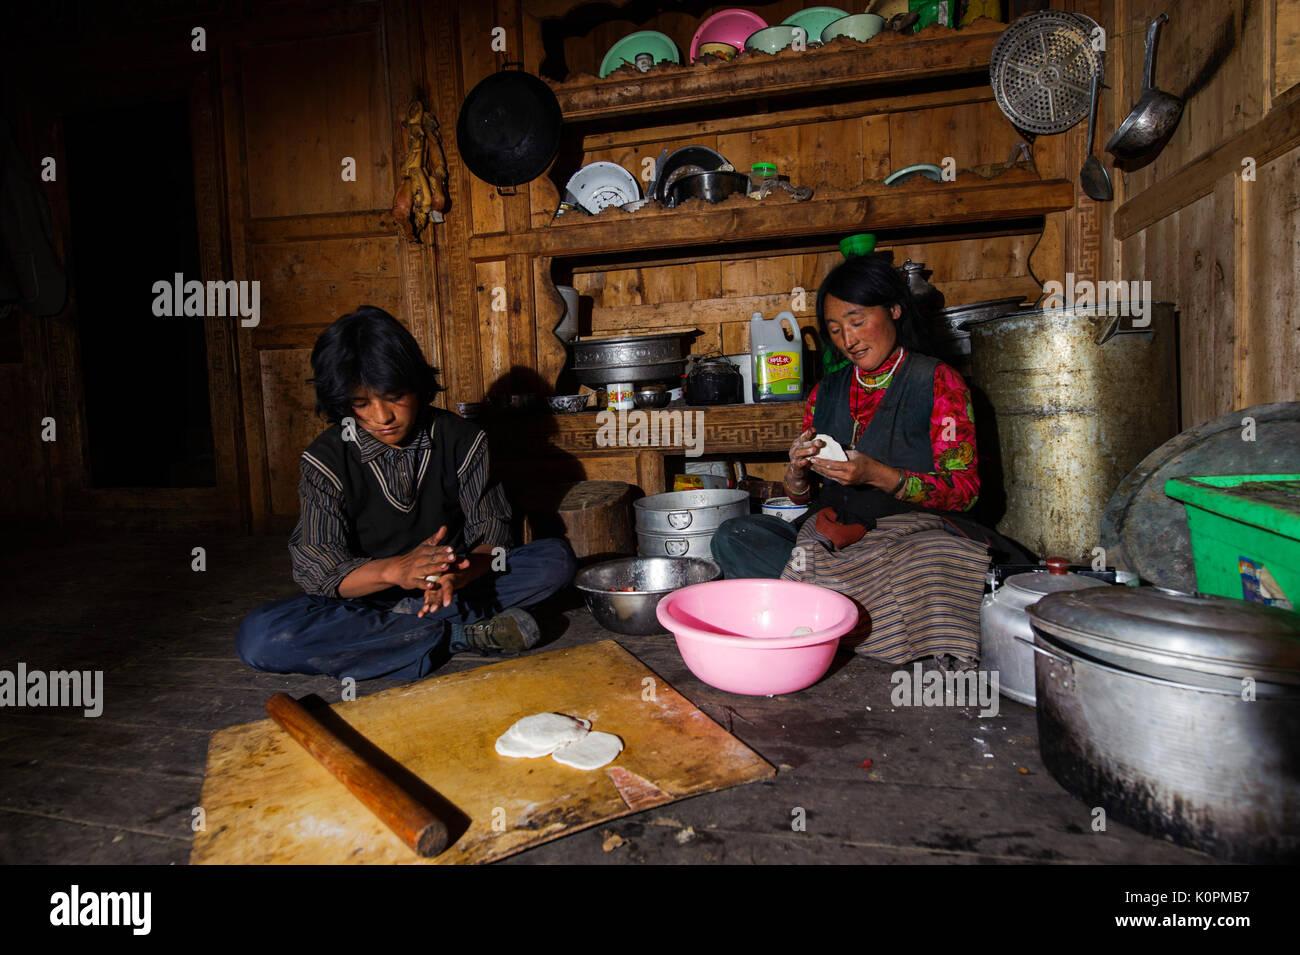 Tibetan mother and son cooking momos, the typical Tibetan dumpling, at home, Kham, Tibet - Stock Image